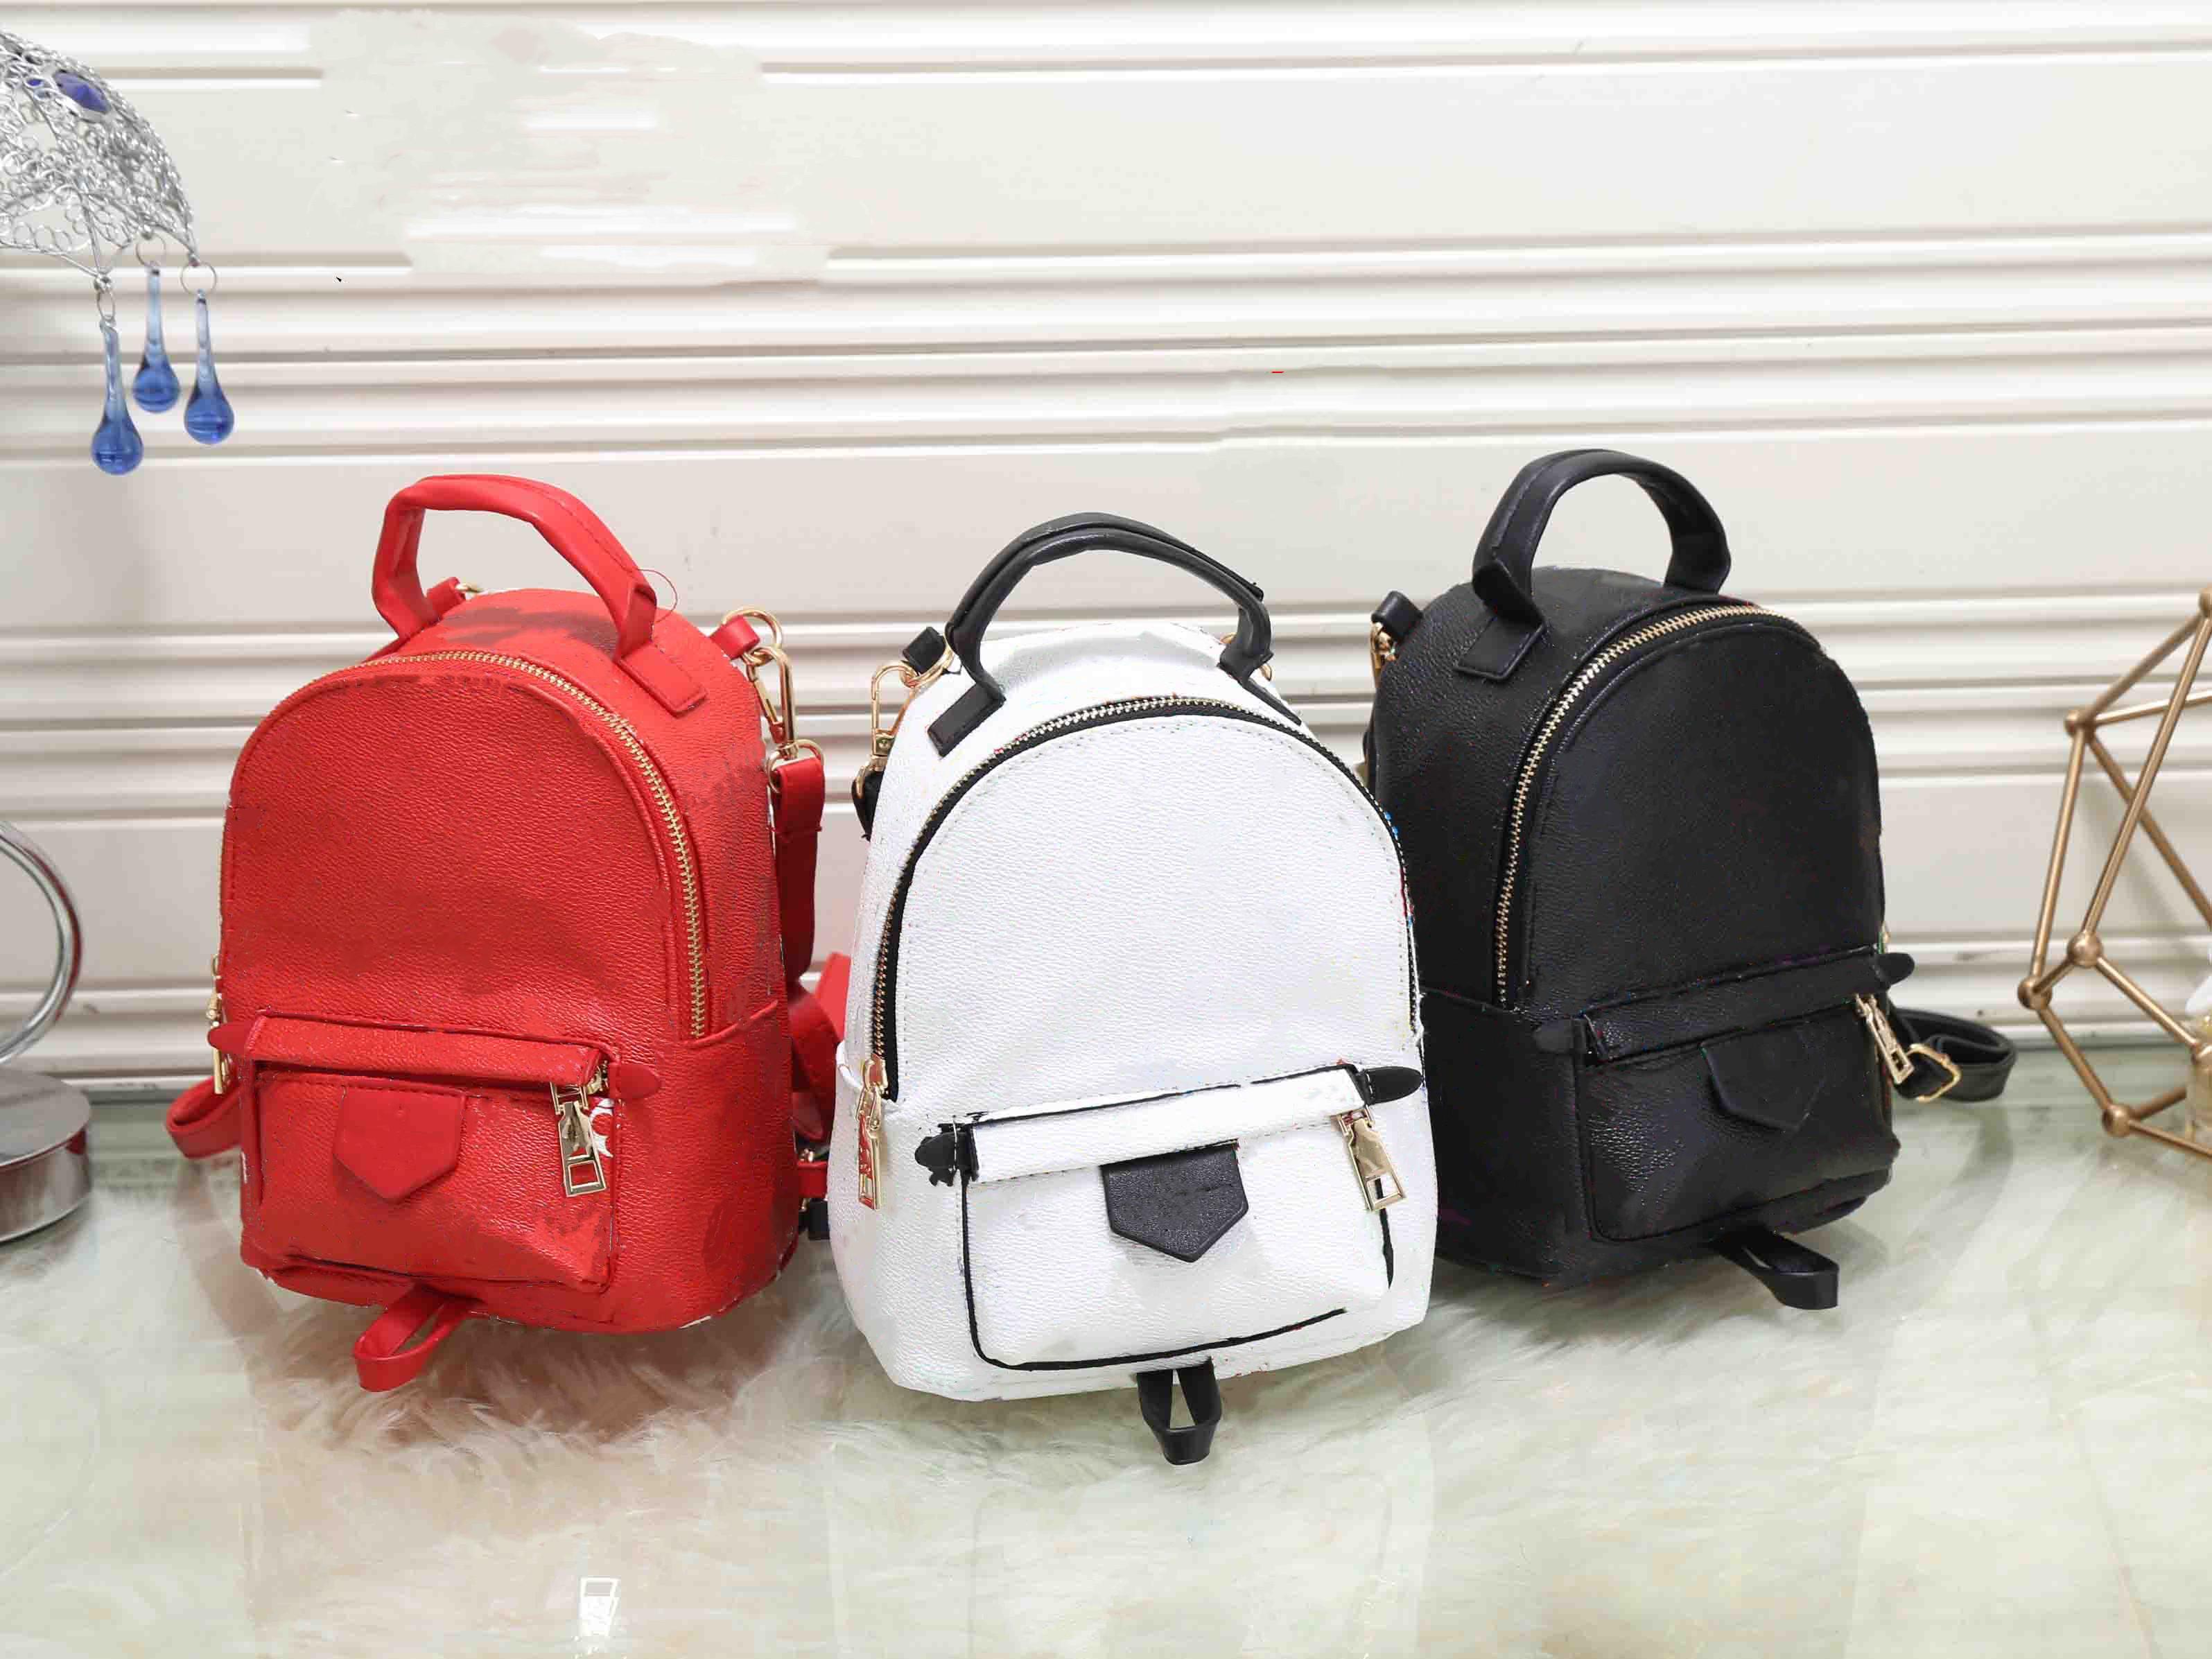 Palm Springs Women Mini Backpack Luxury Designers Bag Ladies Small Backpacks Fashion Mobile Phone Purse 016